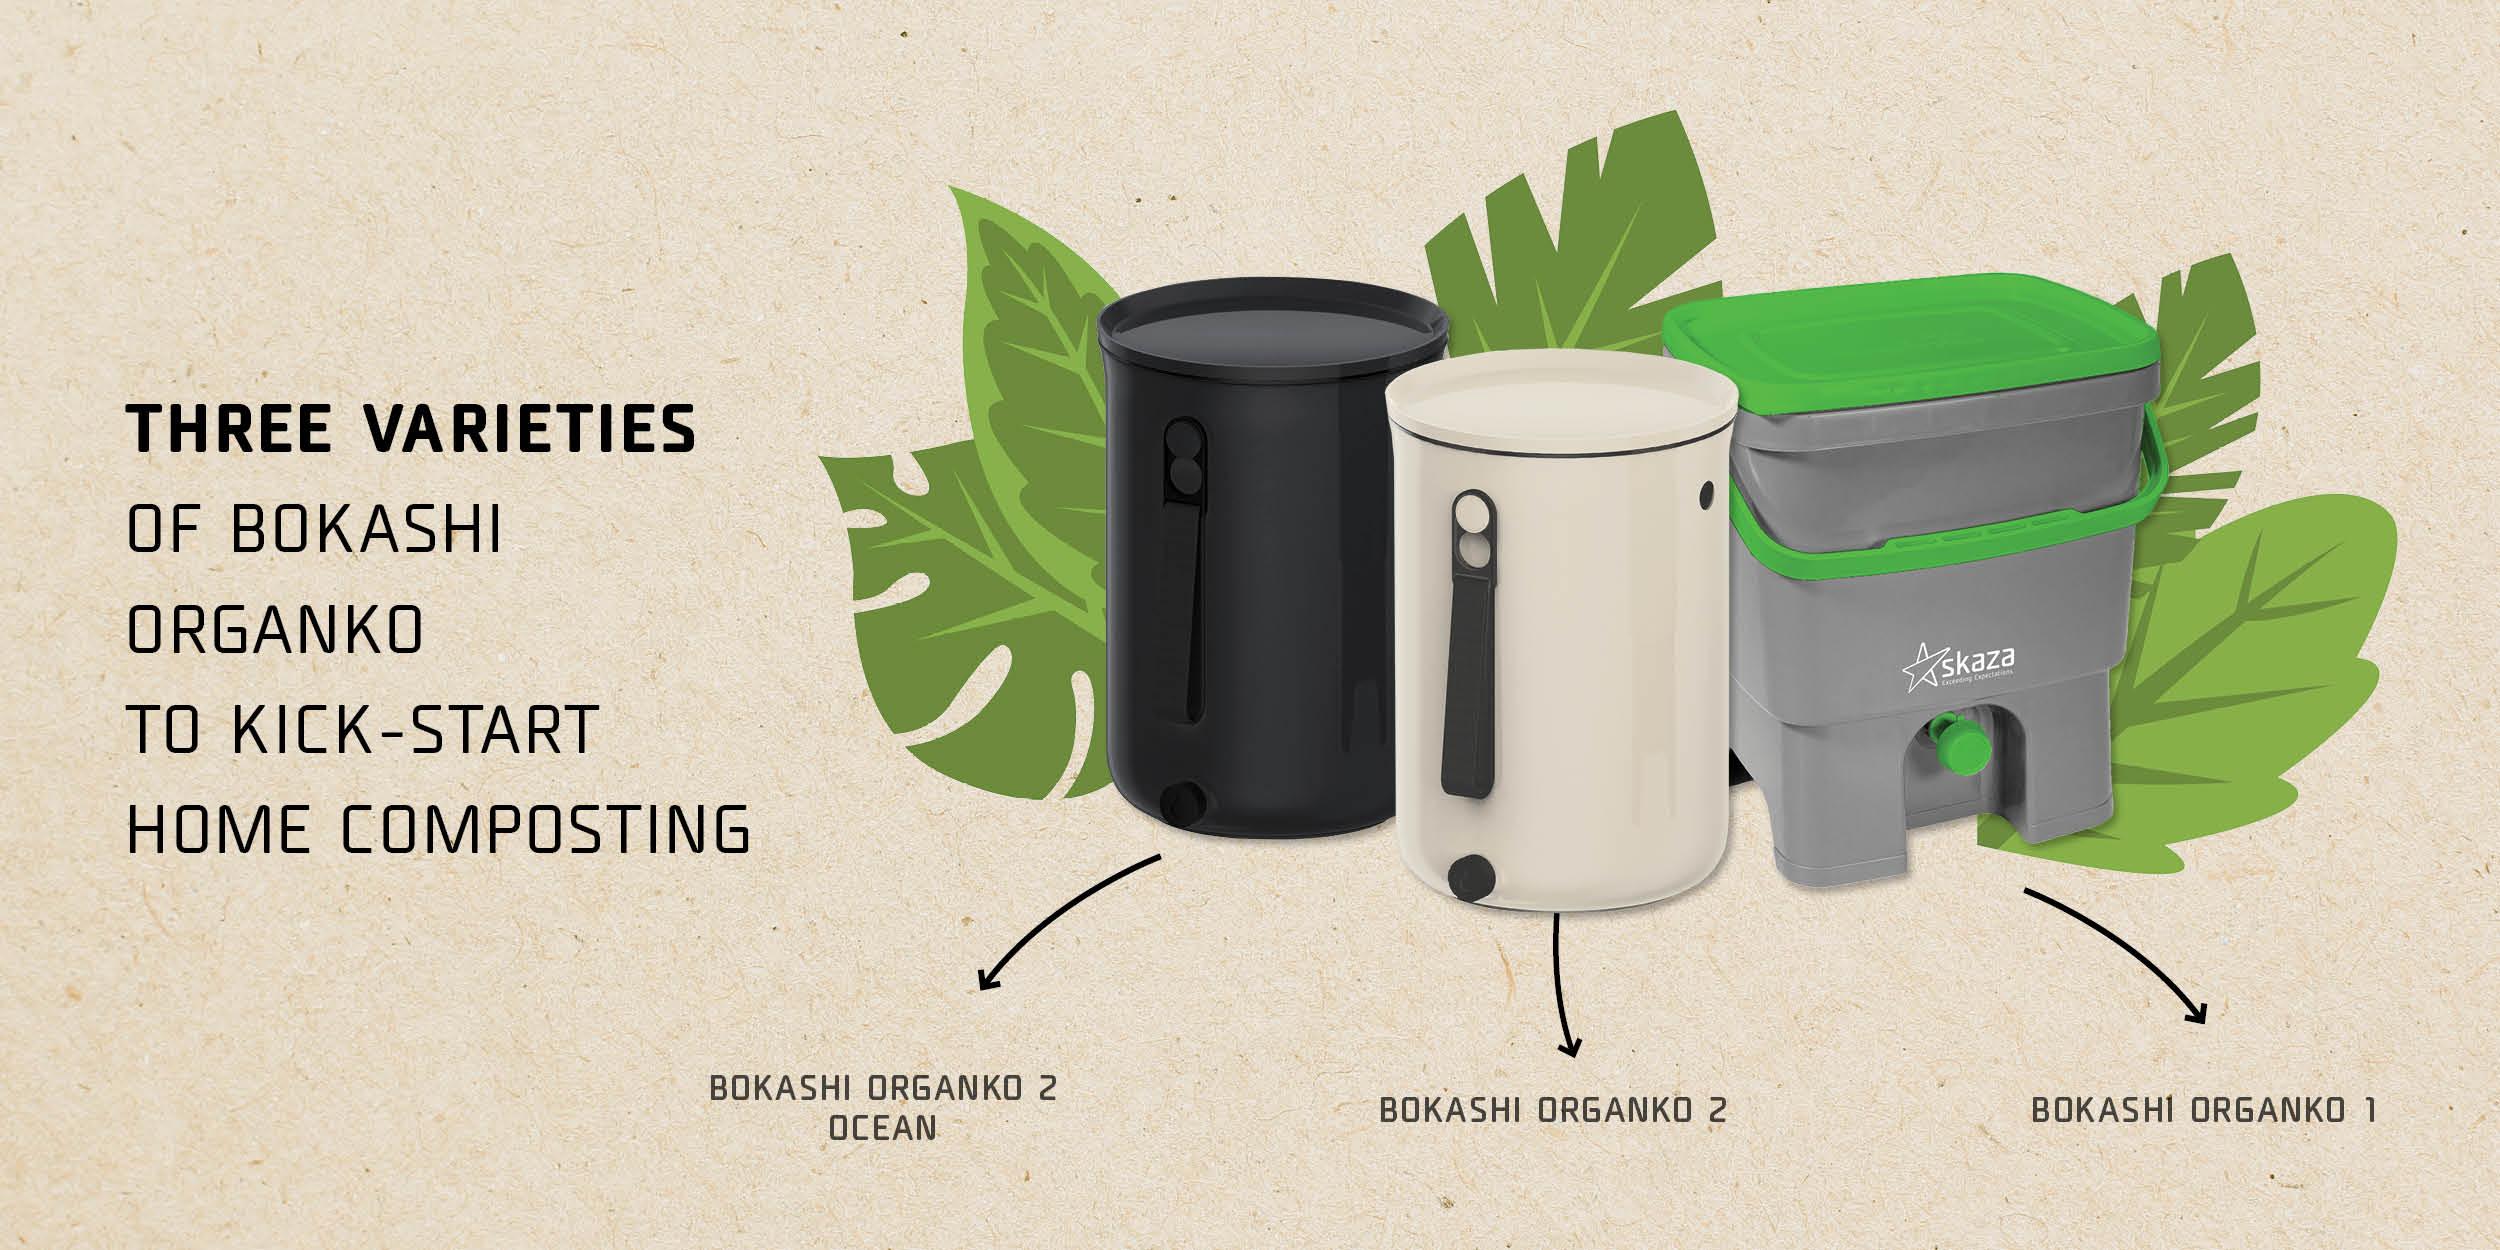 Three varieties of Bokashi Organko to kick-start home composting - infographics